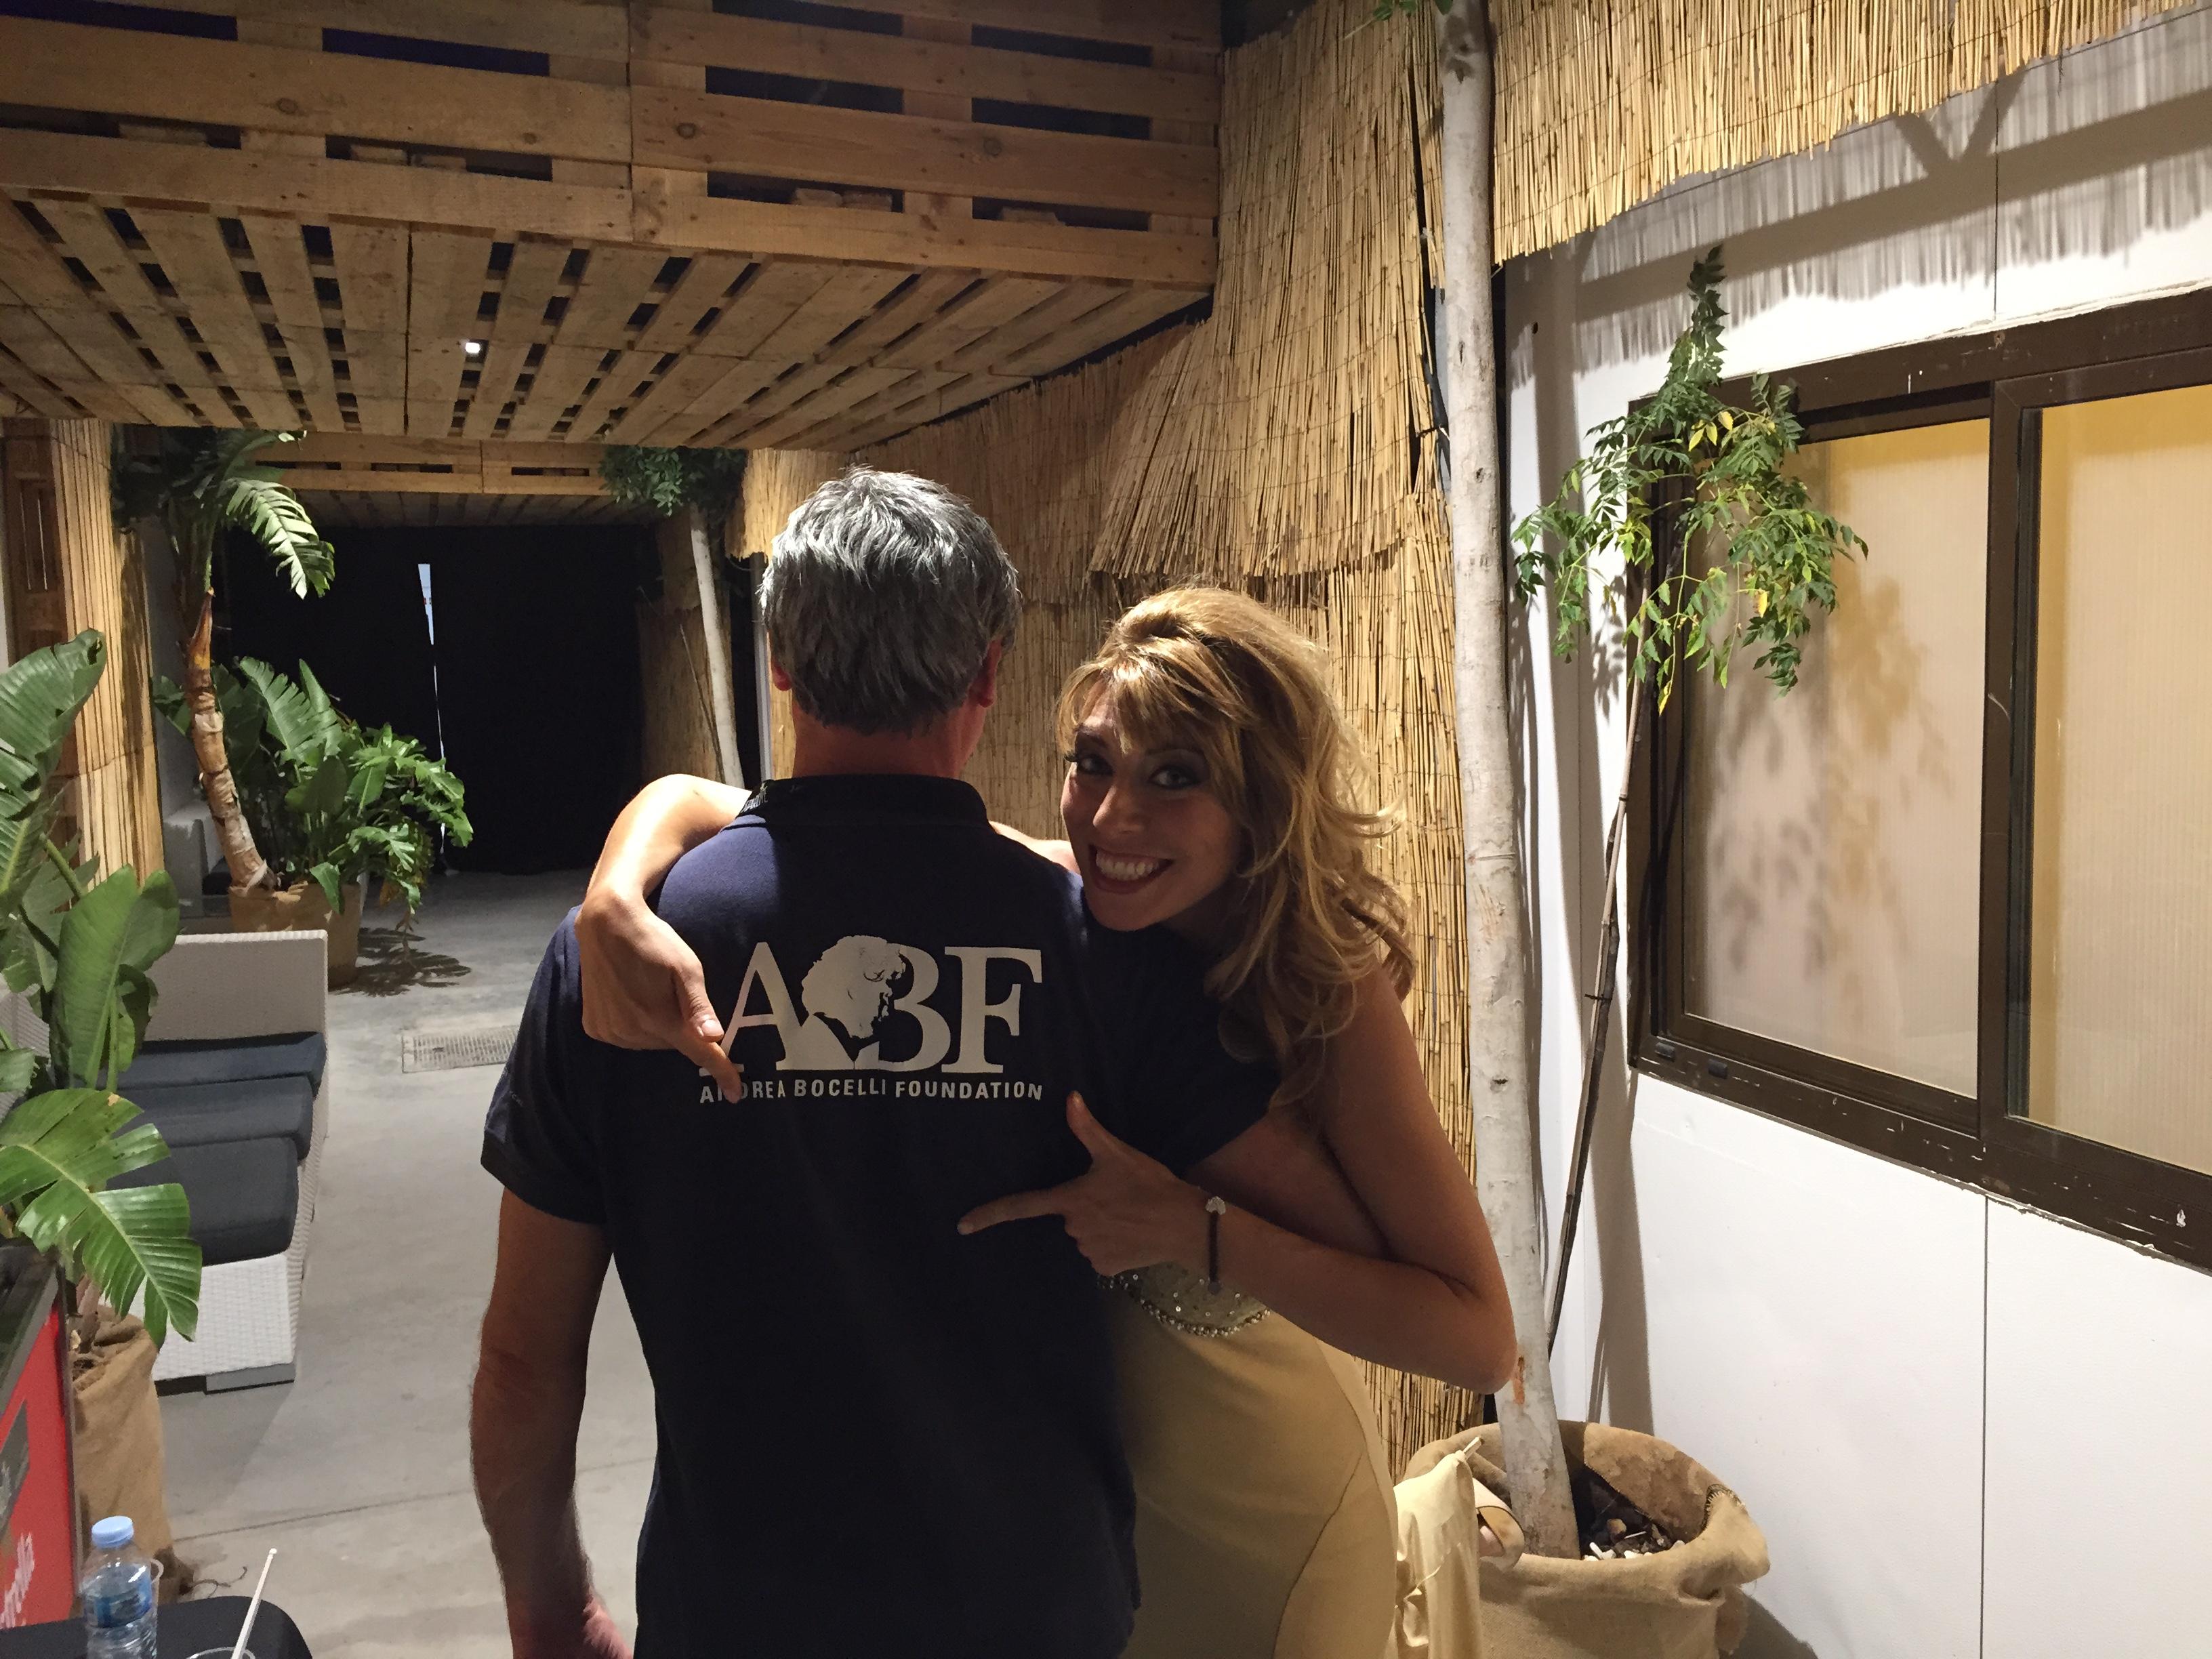 ABF - Friends for Haiti